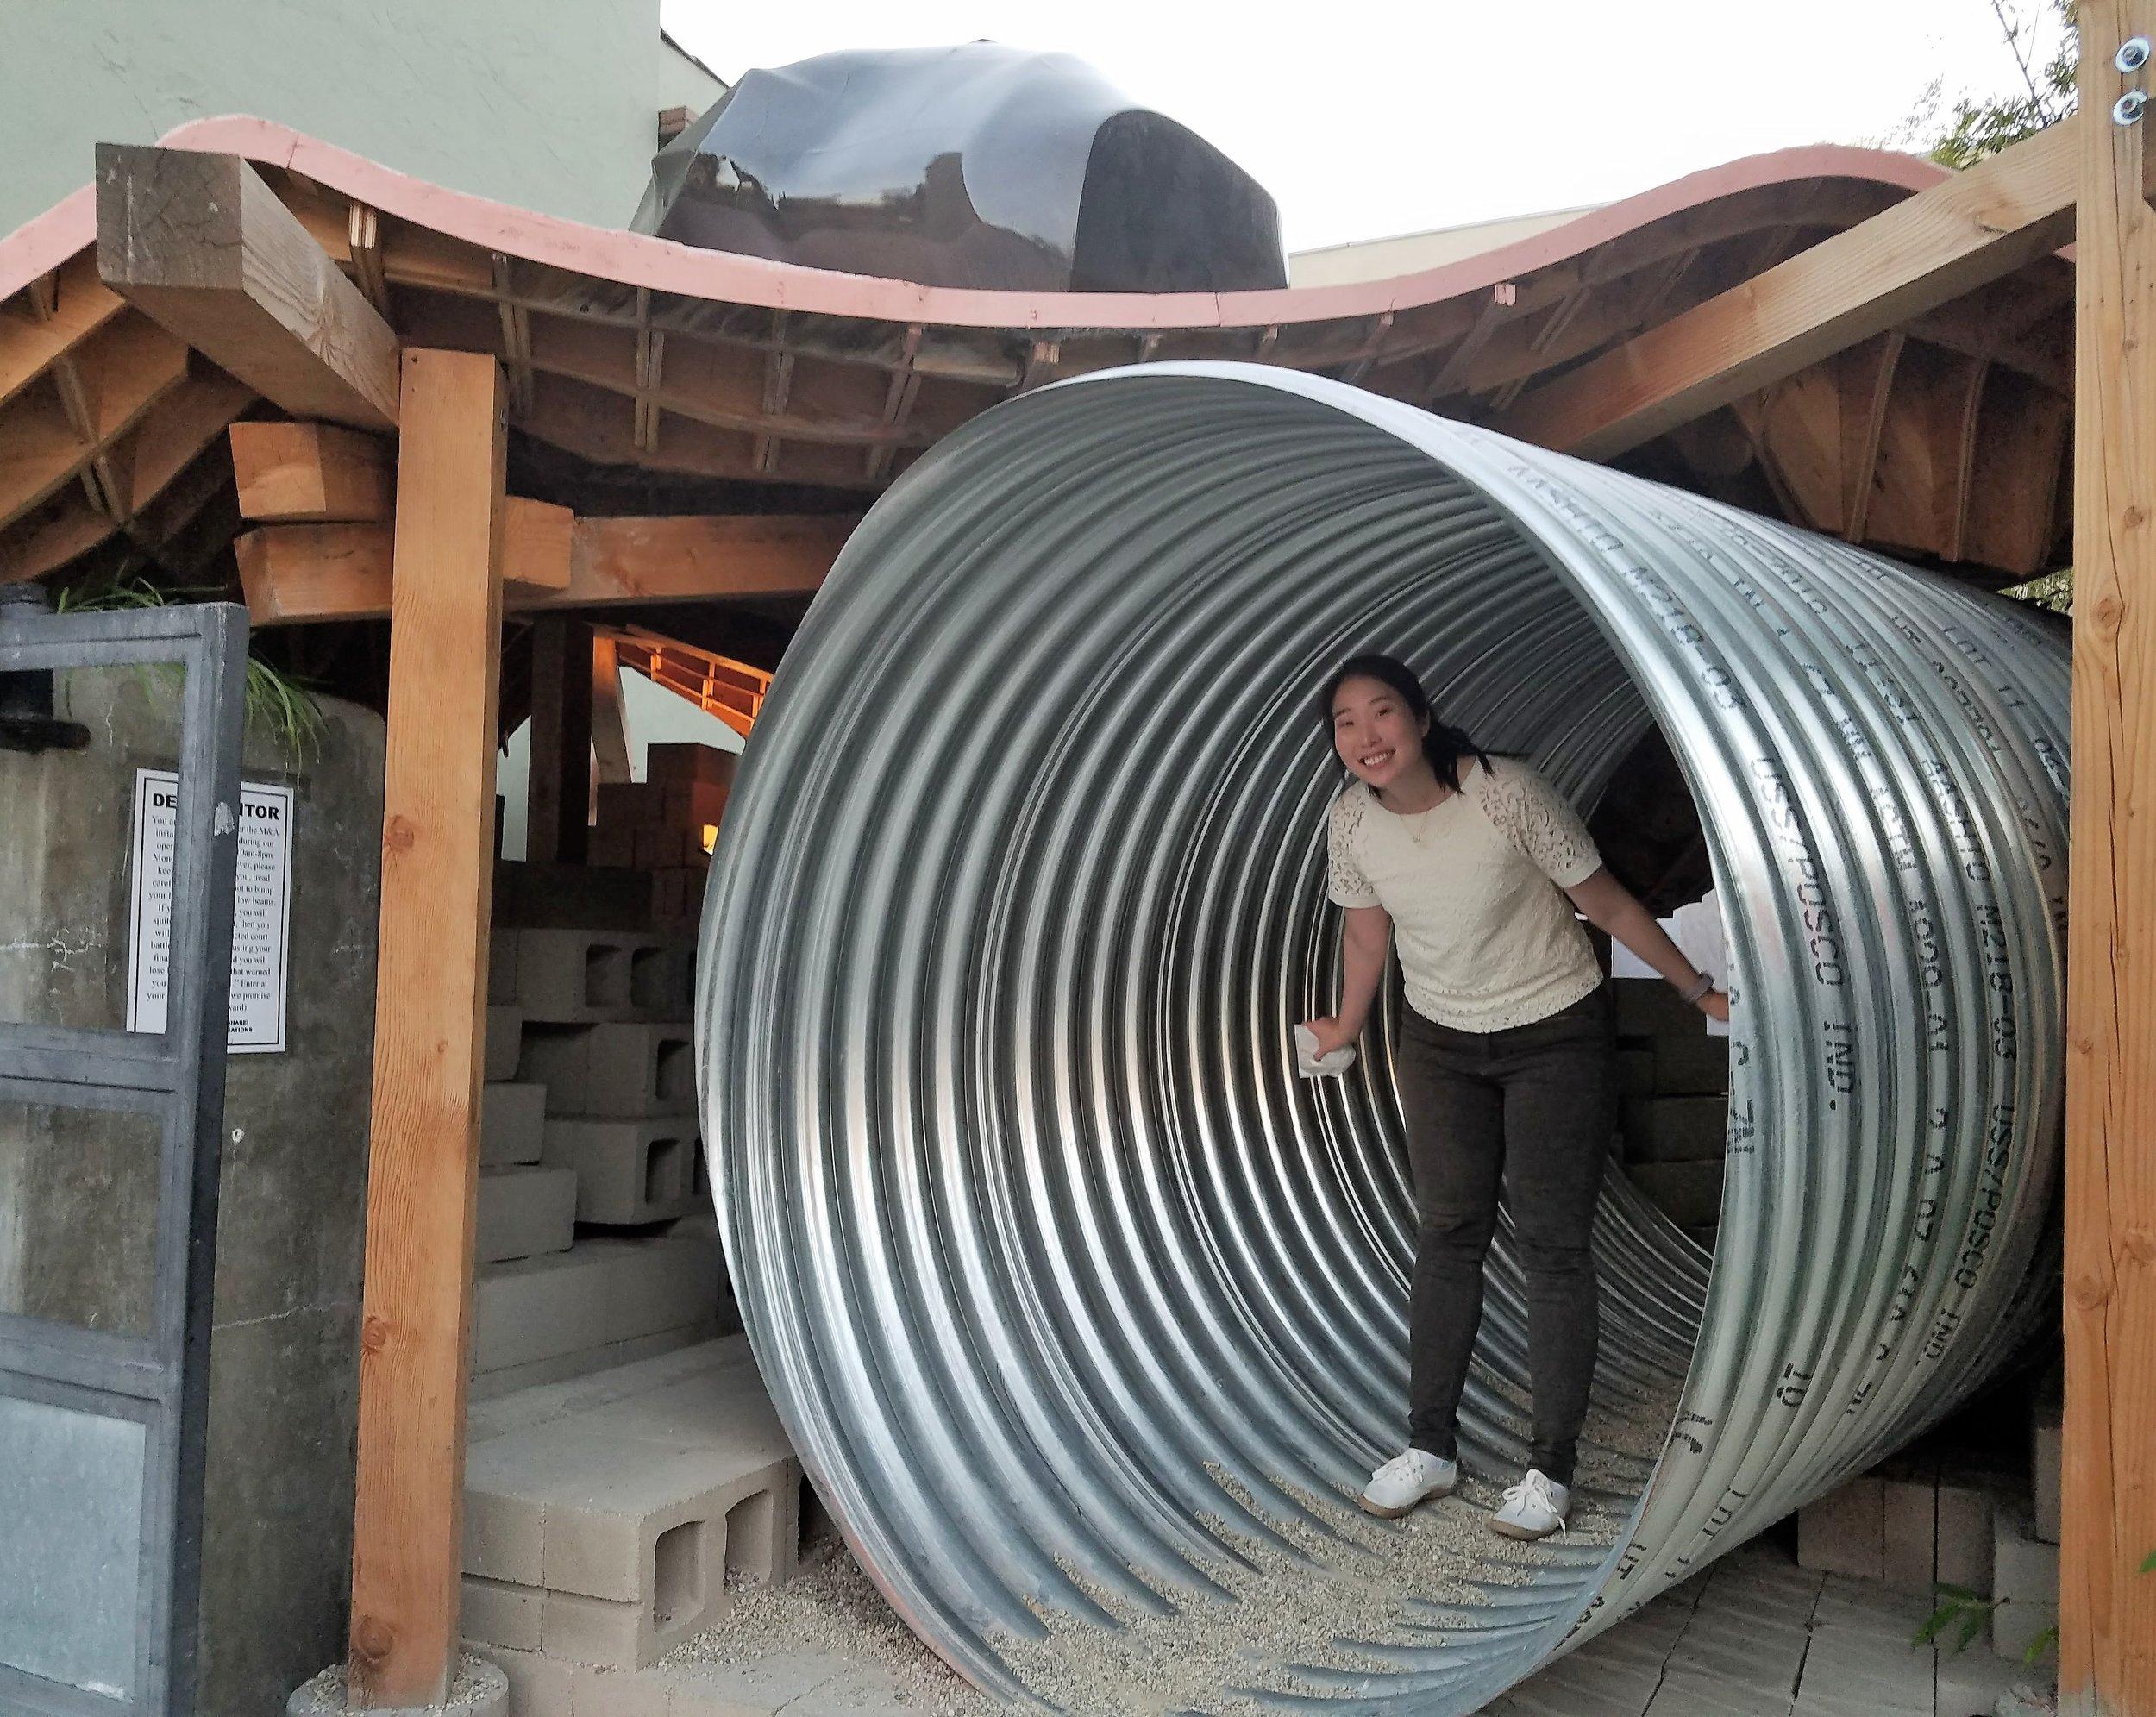 Me inside the Tube installation